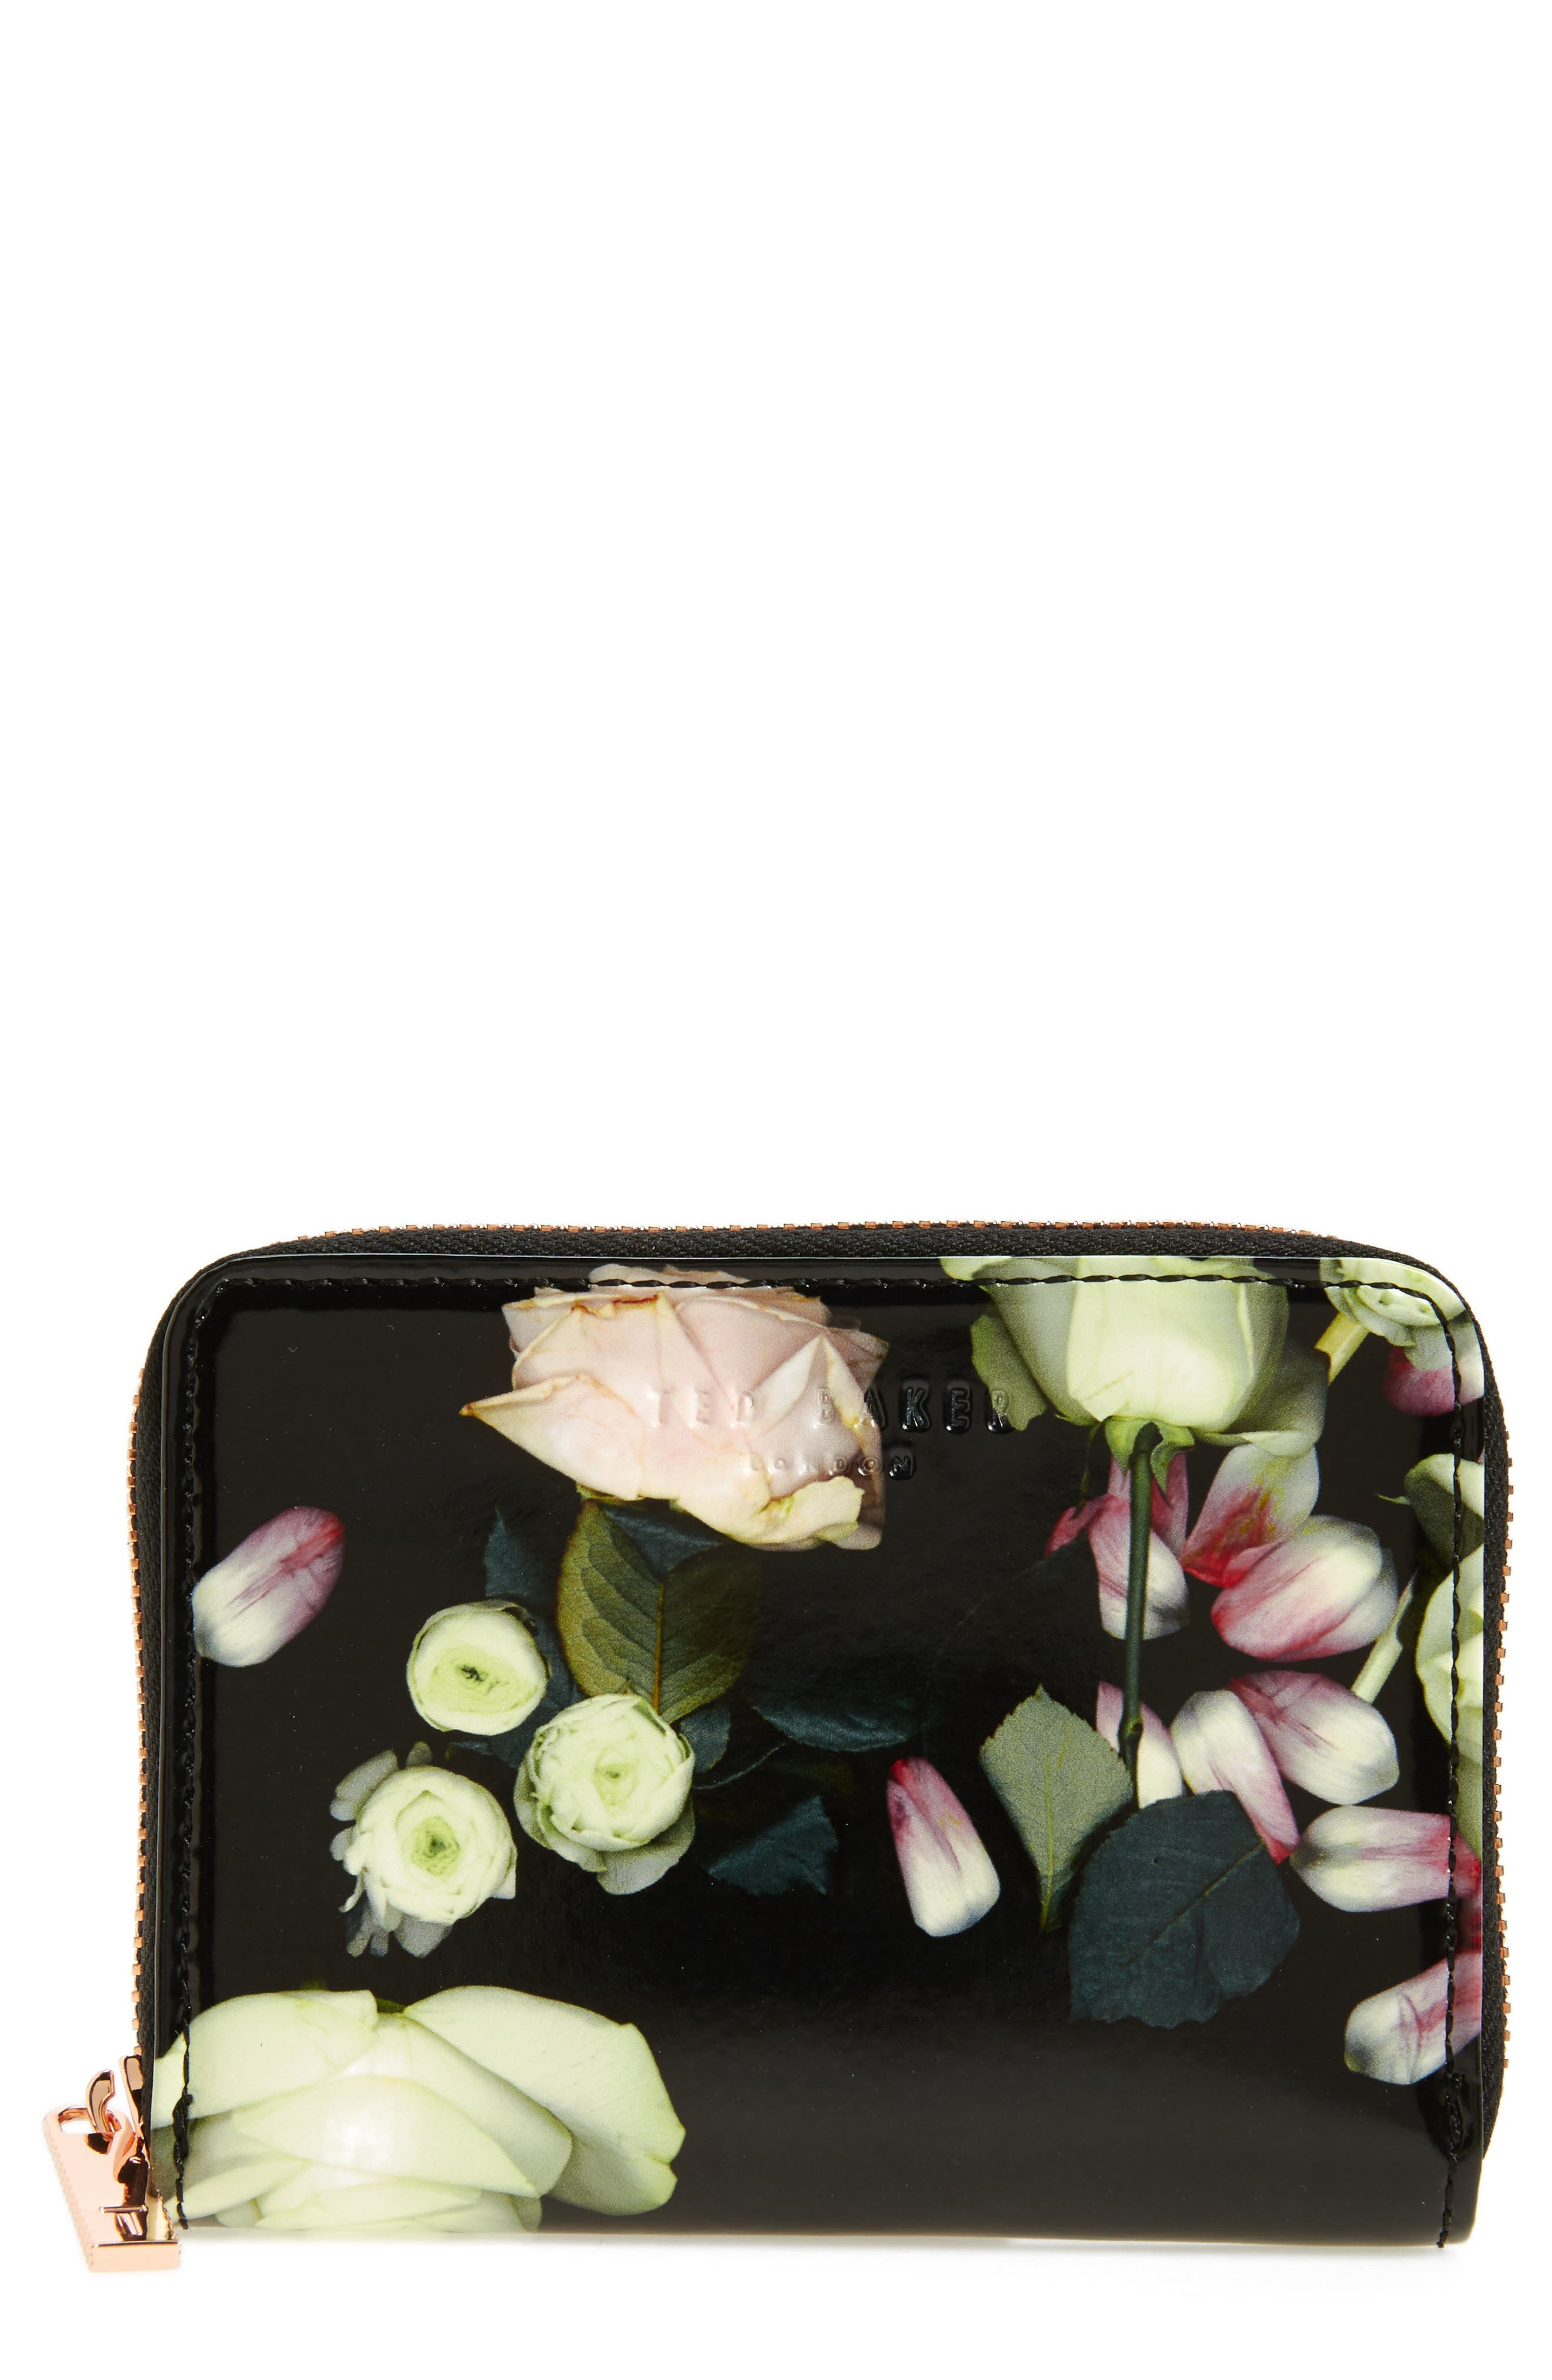 Mayycie Kensington Floral Leather Mini Purse,                             Main thumbnail 1, color,                             001